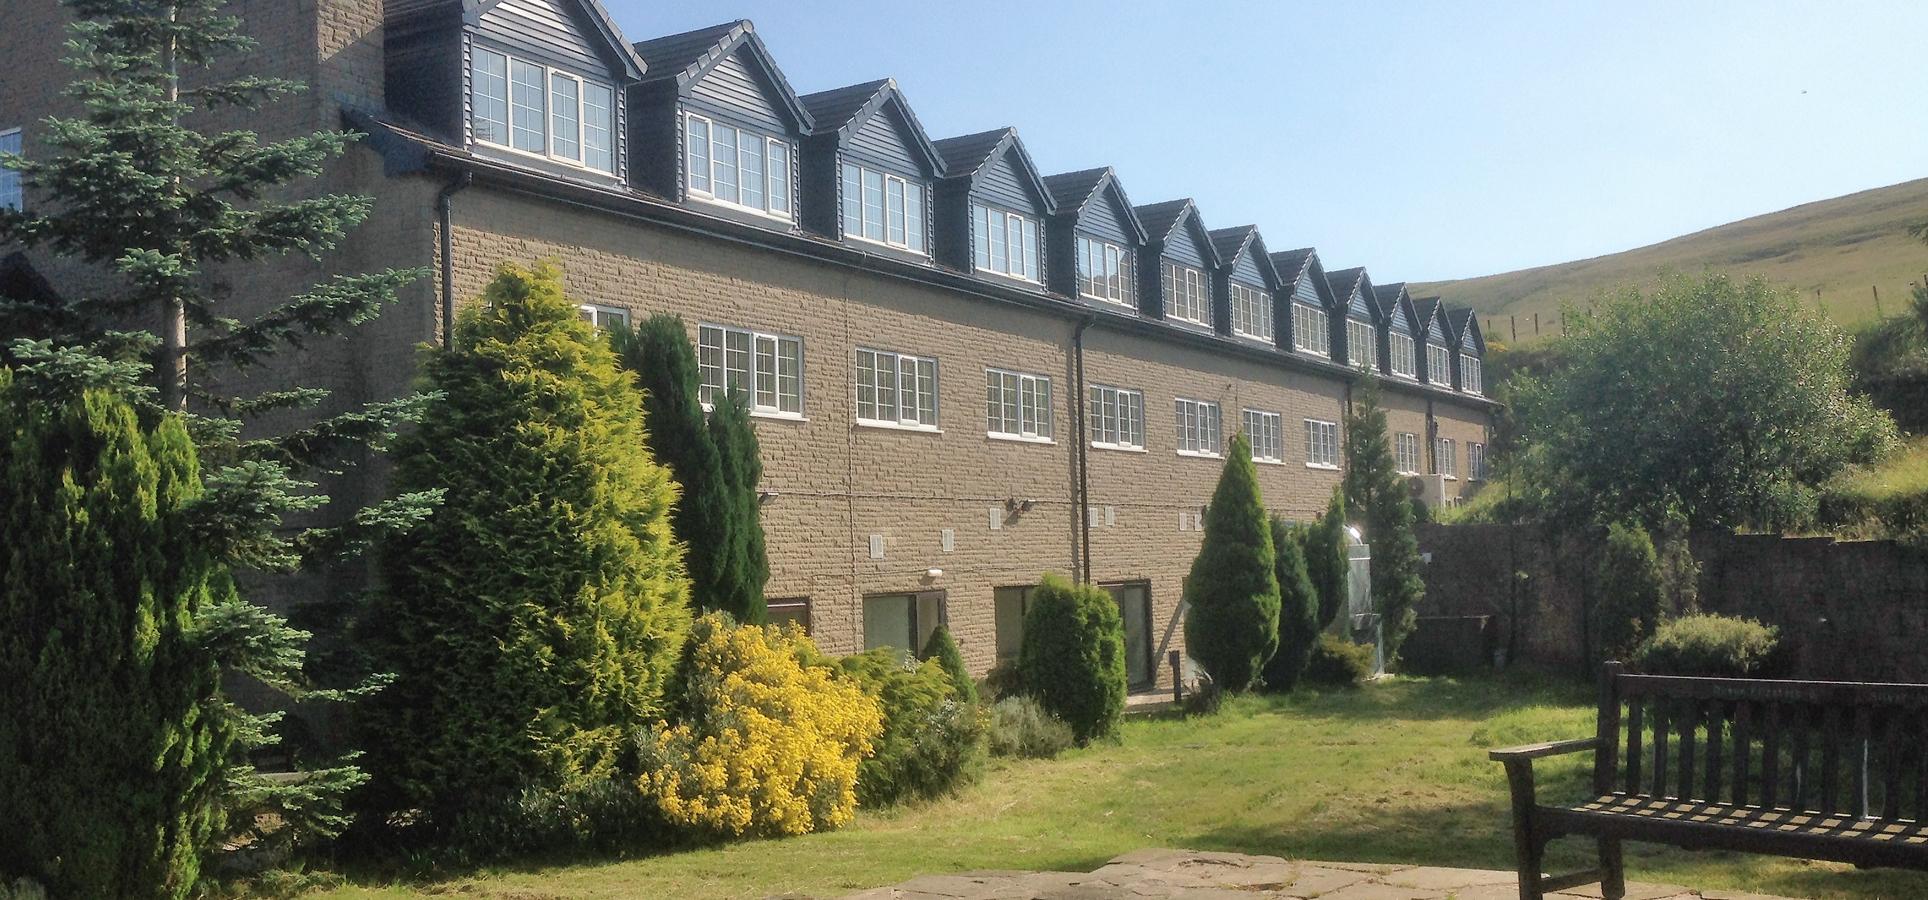 High Peak School, Cheshire, Jessops Construction Ltd